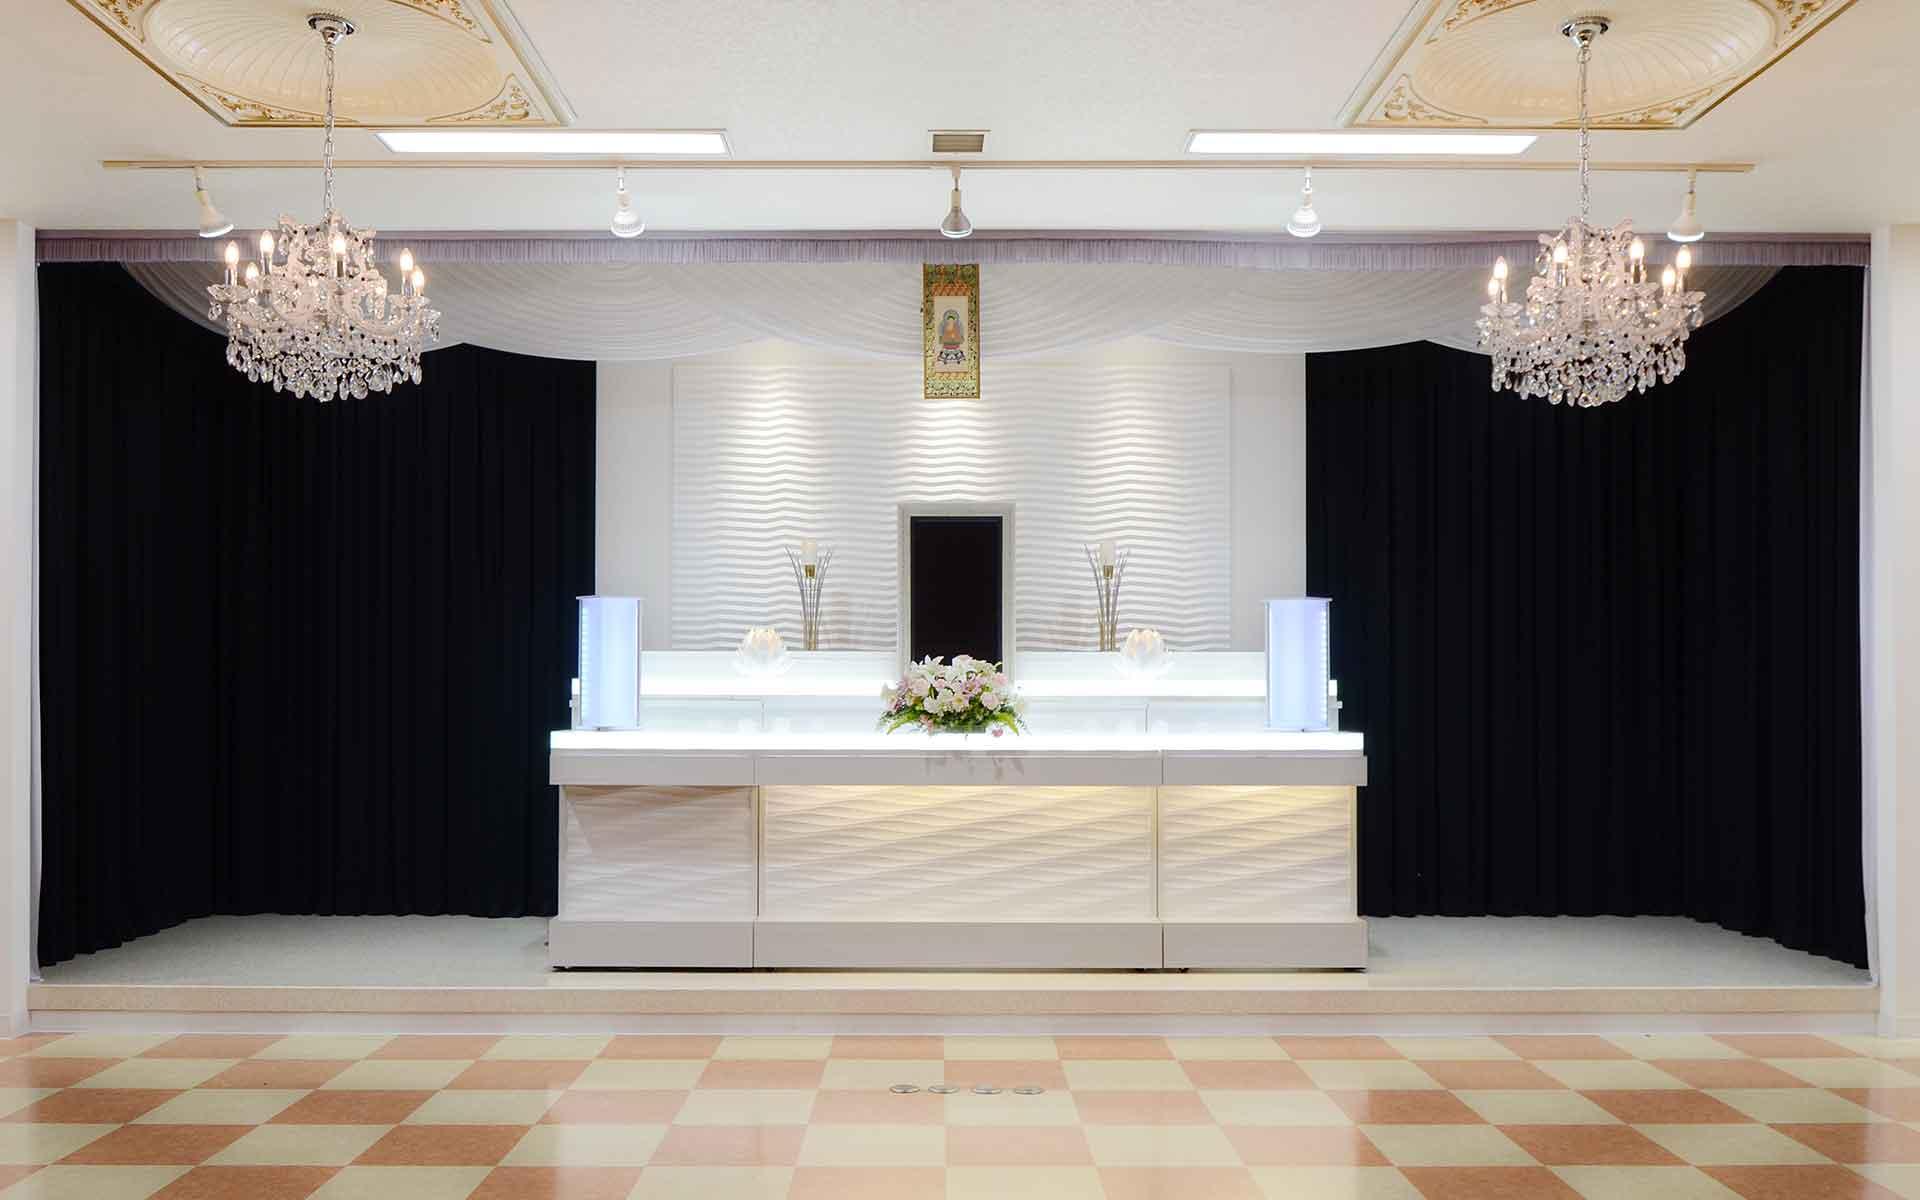 宇都宮/高根沢町で一般葬